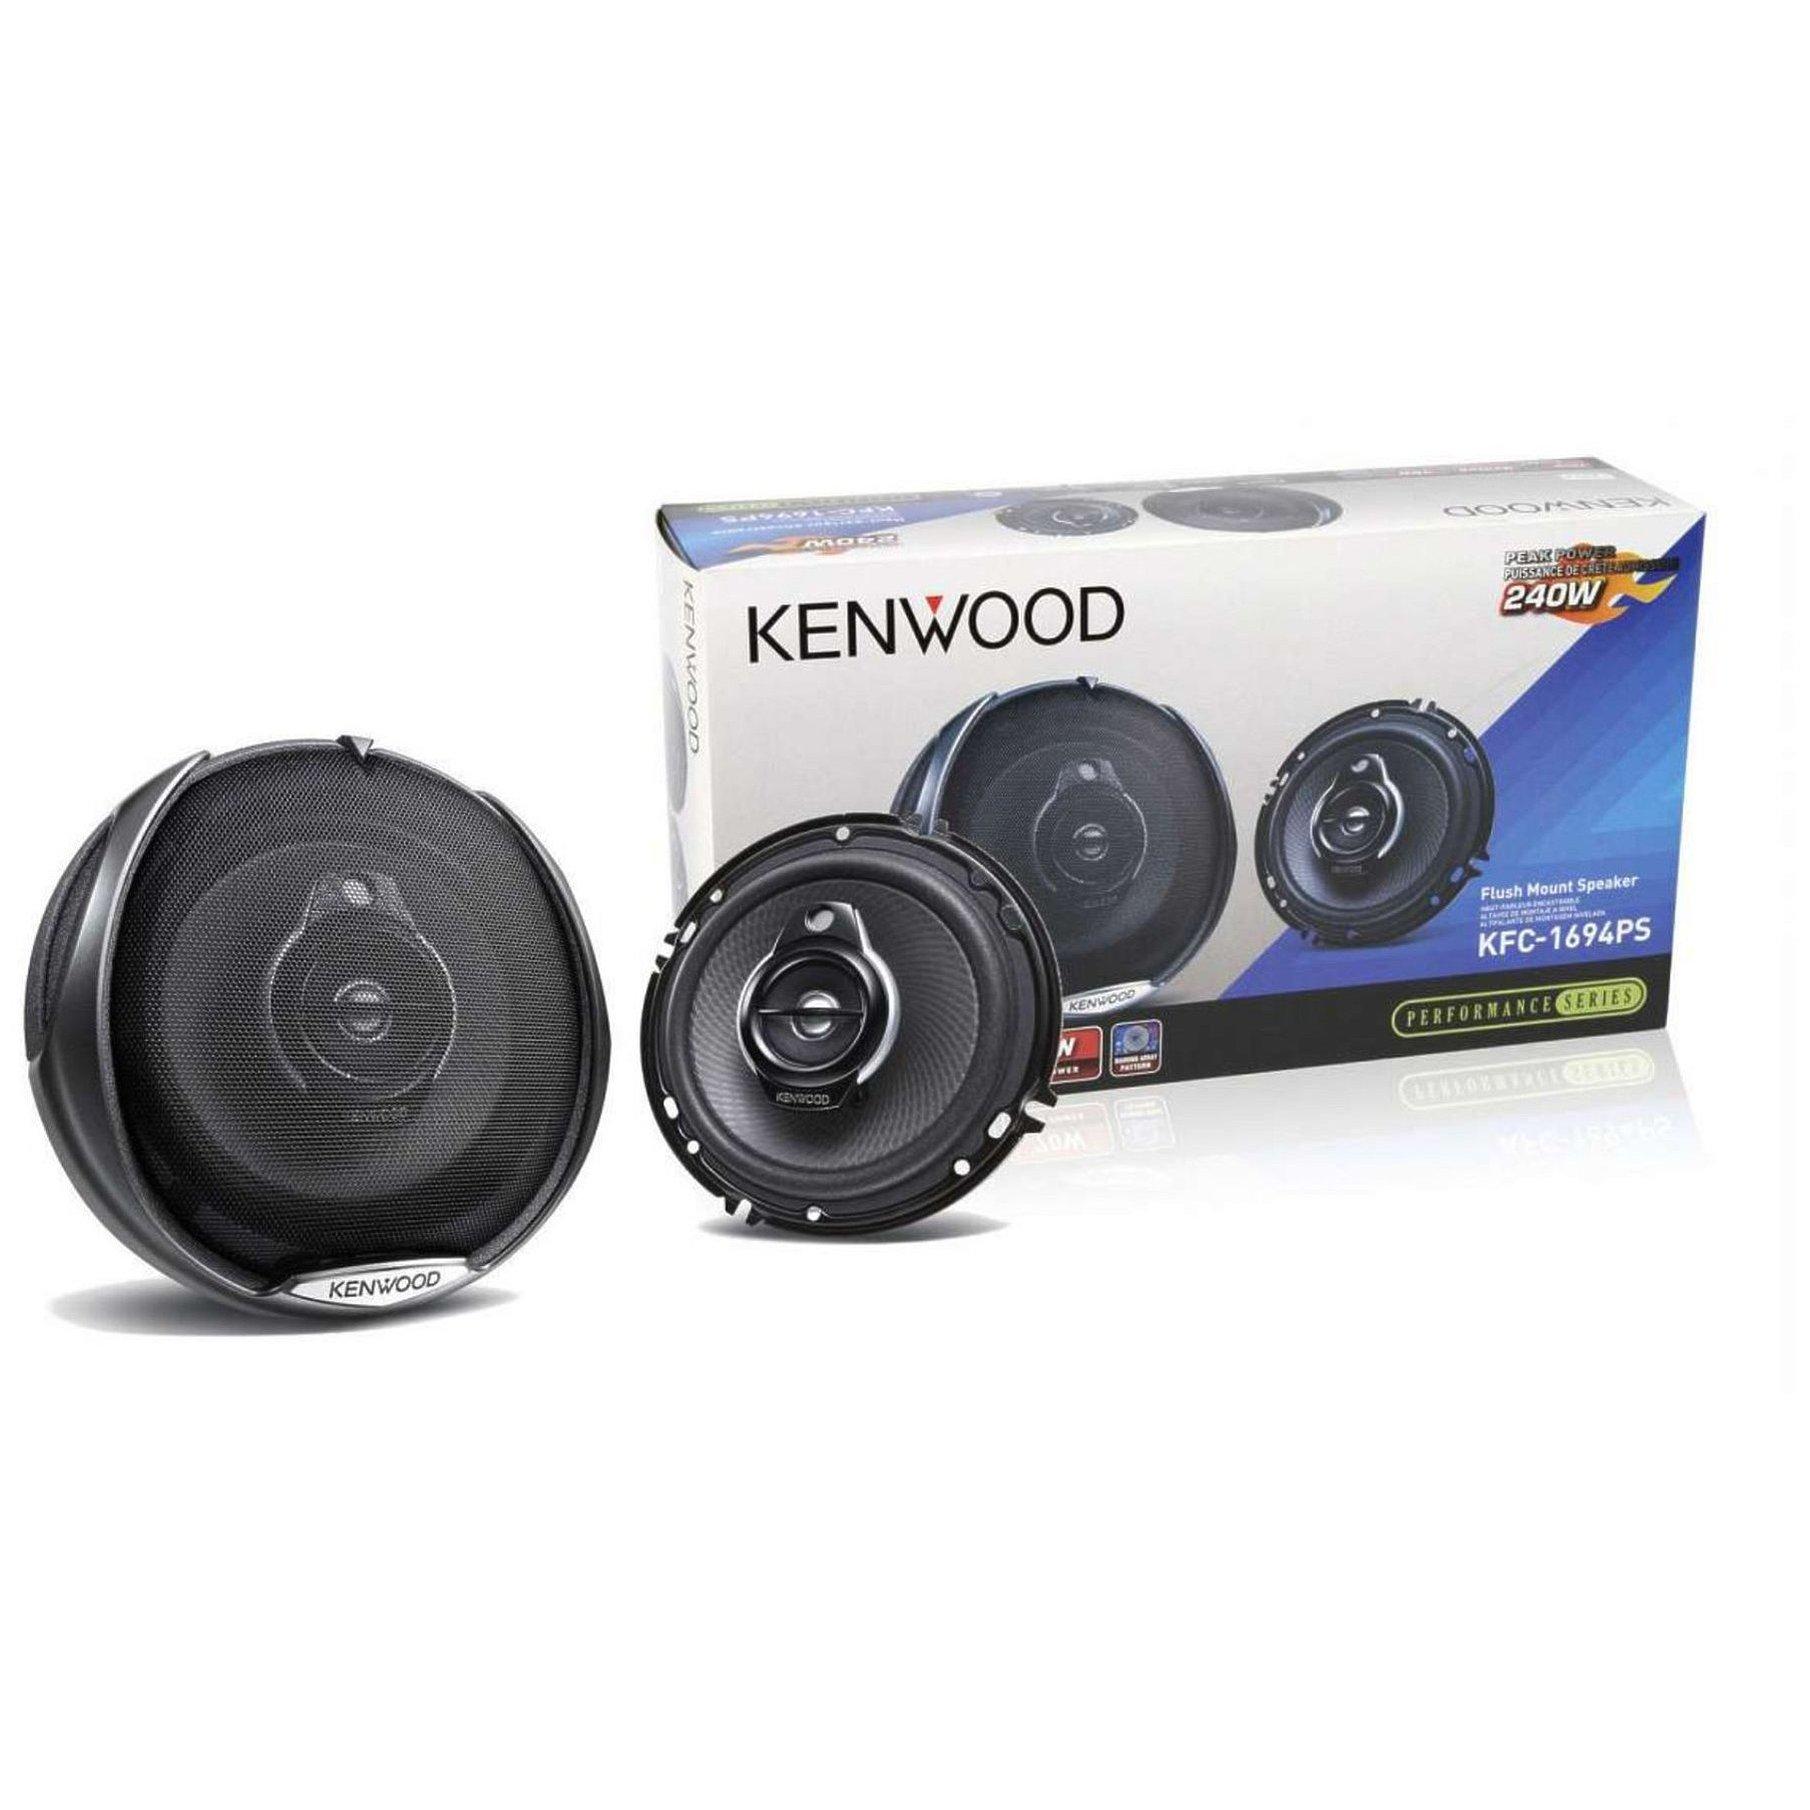 "Kenwood KFC-1694PS 6 1/2"" 3 Way Car Speaker Pair 6.5 New KFC1694PS"